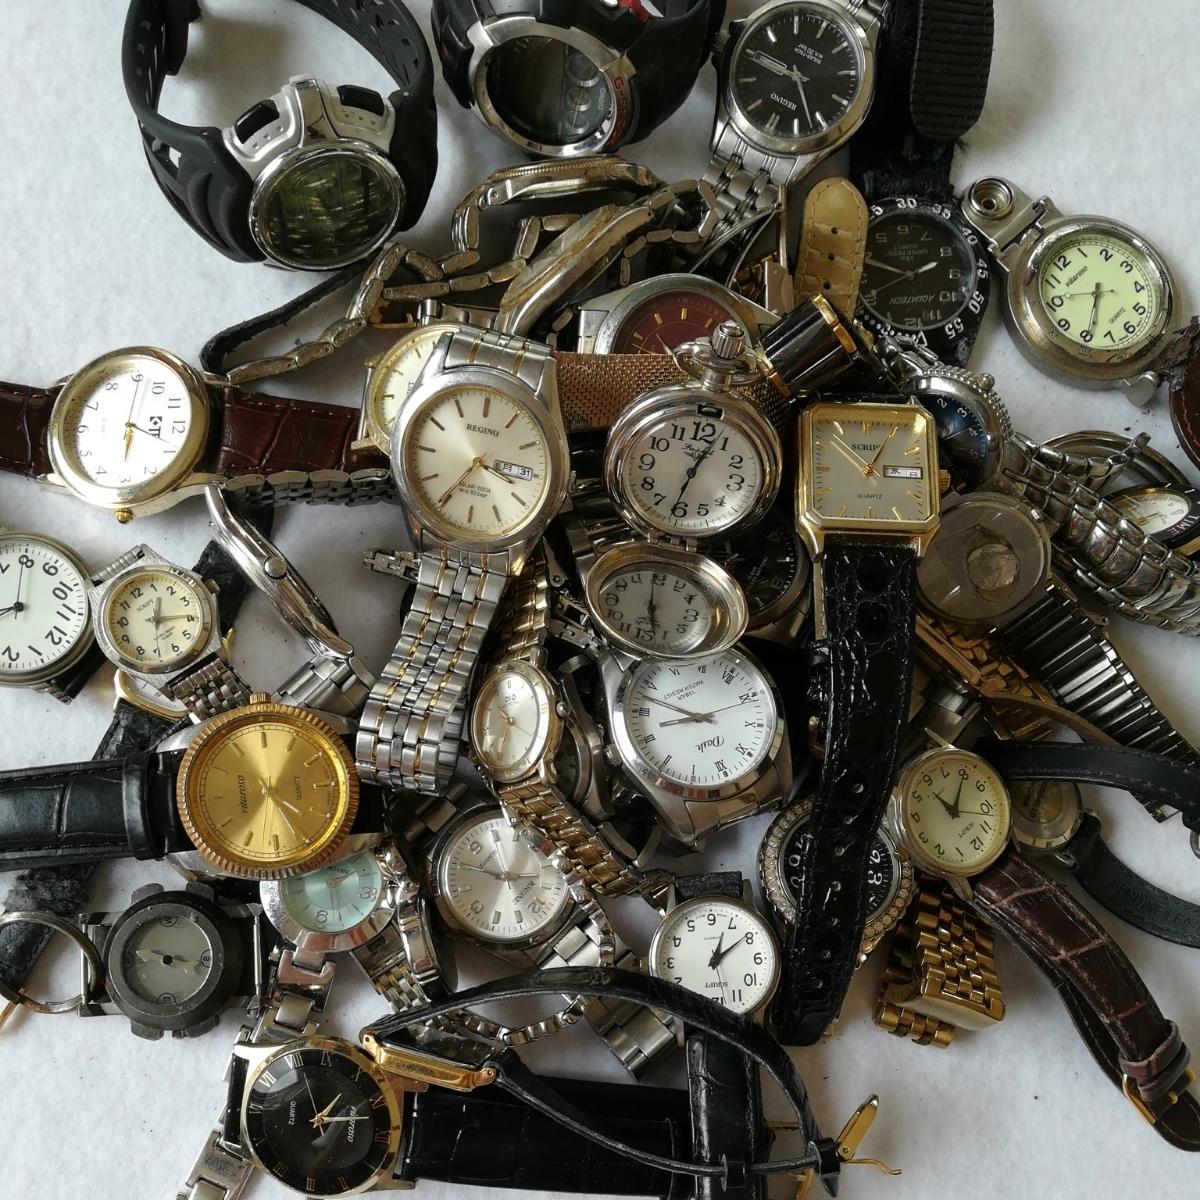 fc0afb74a2 1円~SCRIPT REGUNO pierre cardin ELGIN 時計 腕時計 大量 まとめて44点 動作